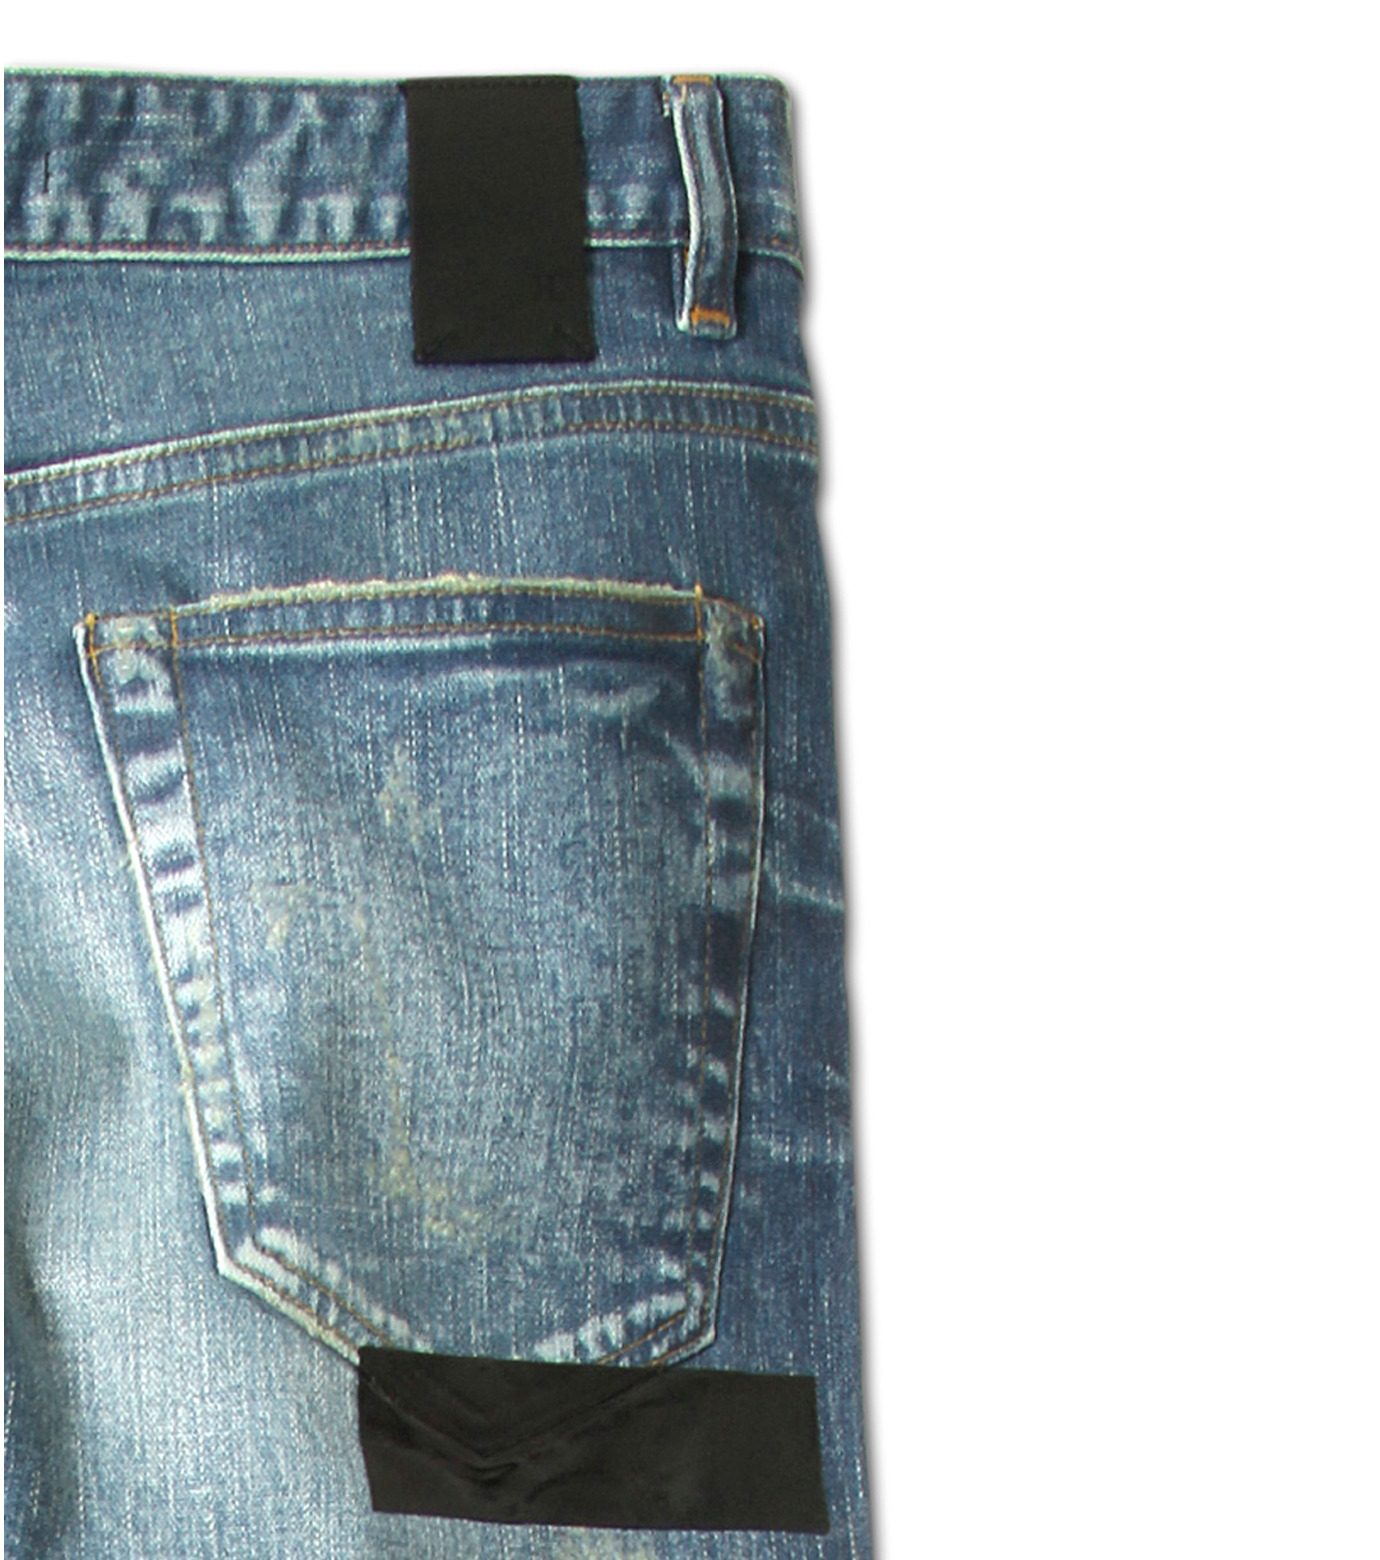 HL HEDDIE LOVU(エイチエル・エディールーヴ)のIndigo Coat Skin Slim-NAVY(パンツ/pants)-17S98005-93 拡大詳細画像9